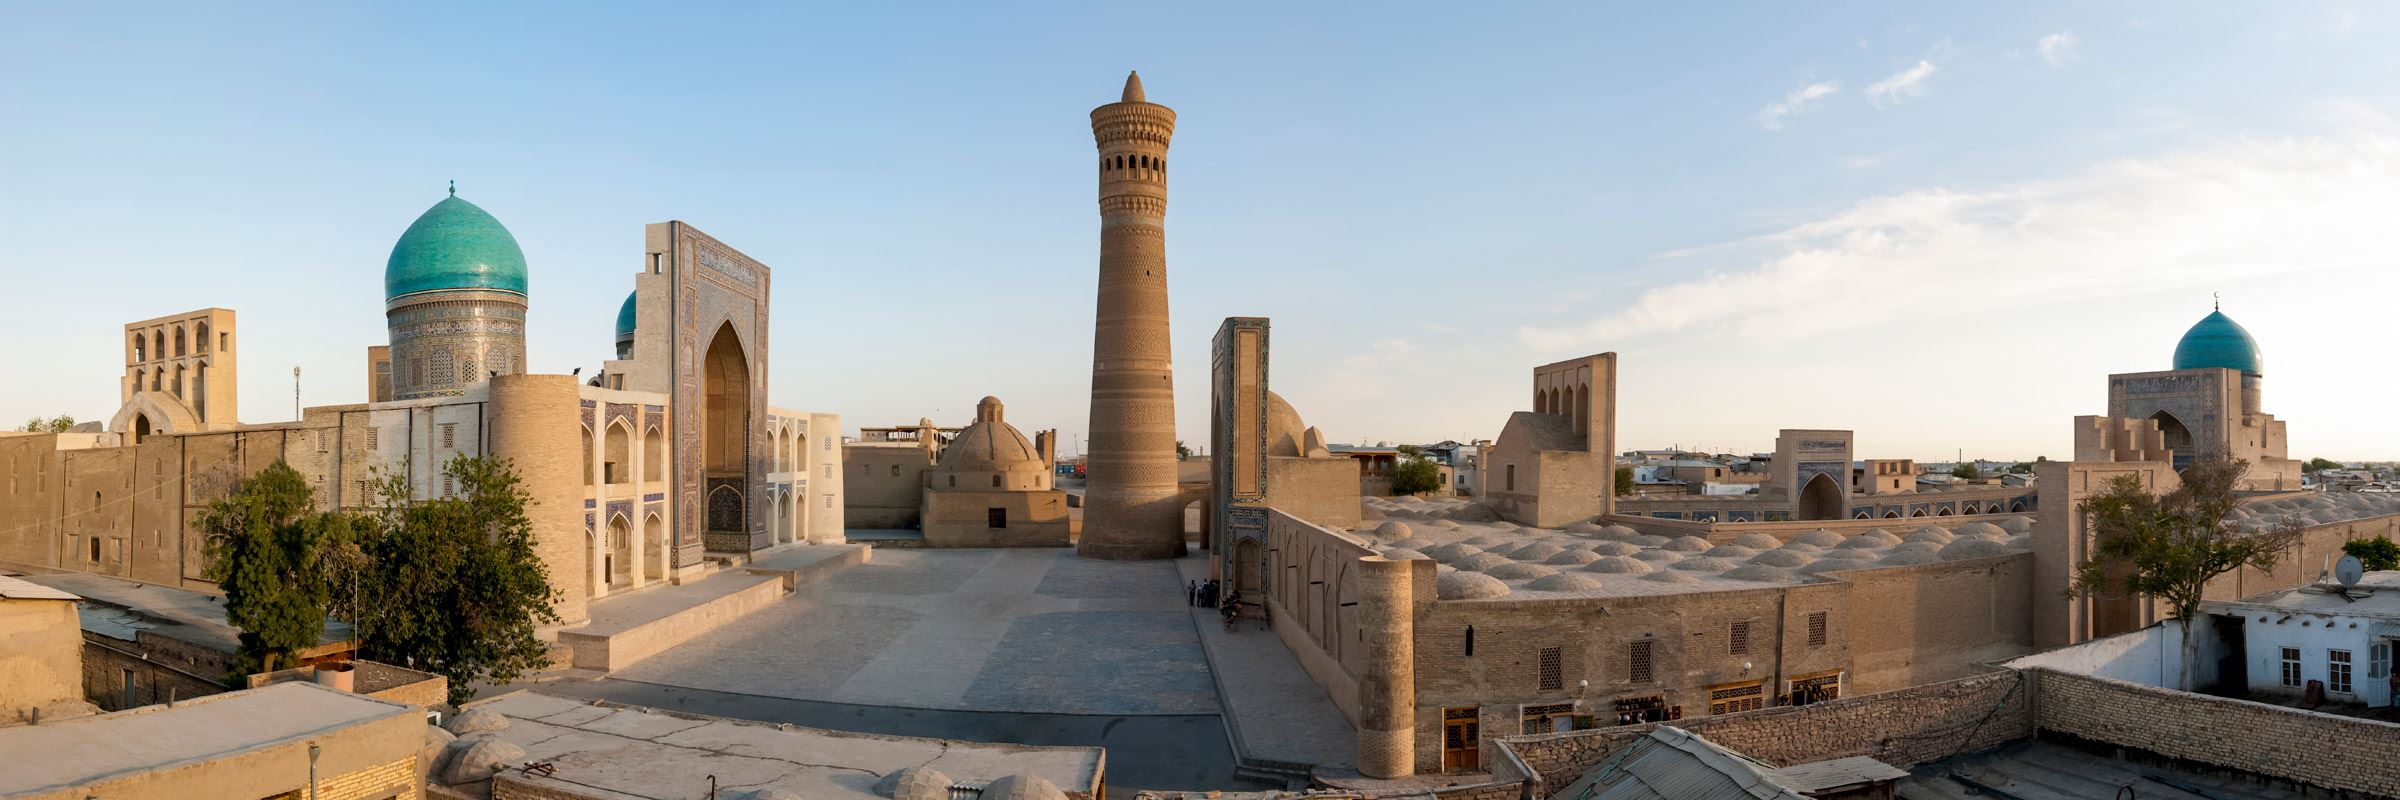 visit bukhara on a trip to uzbekistan